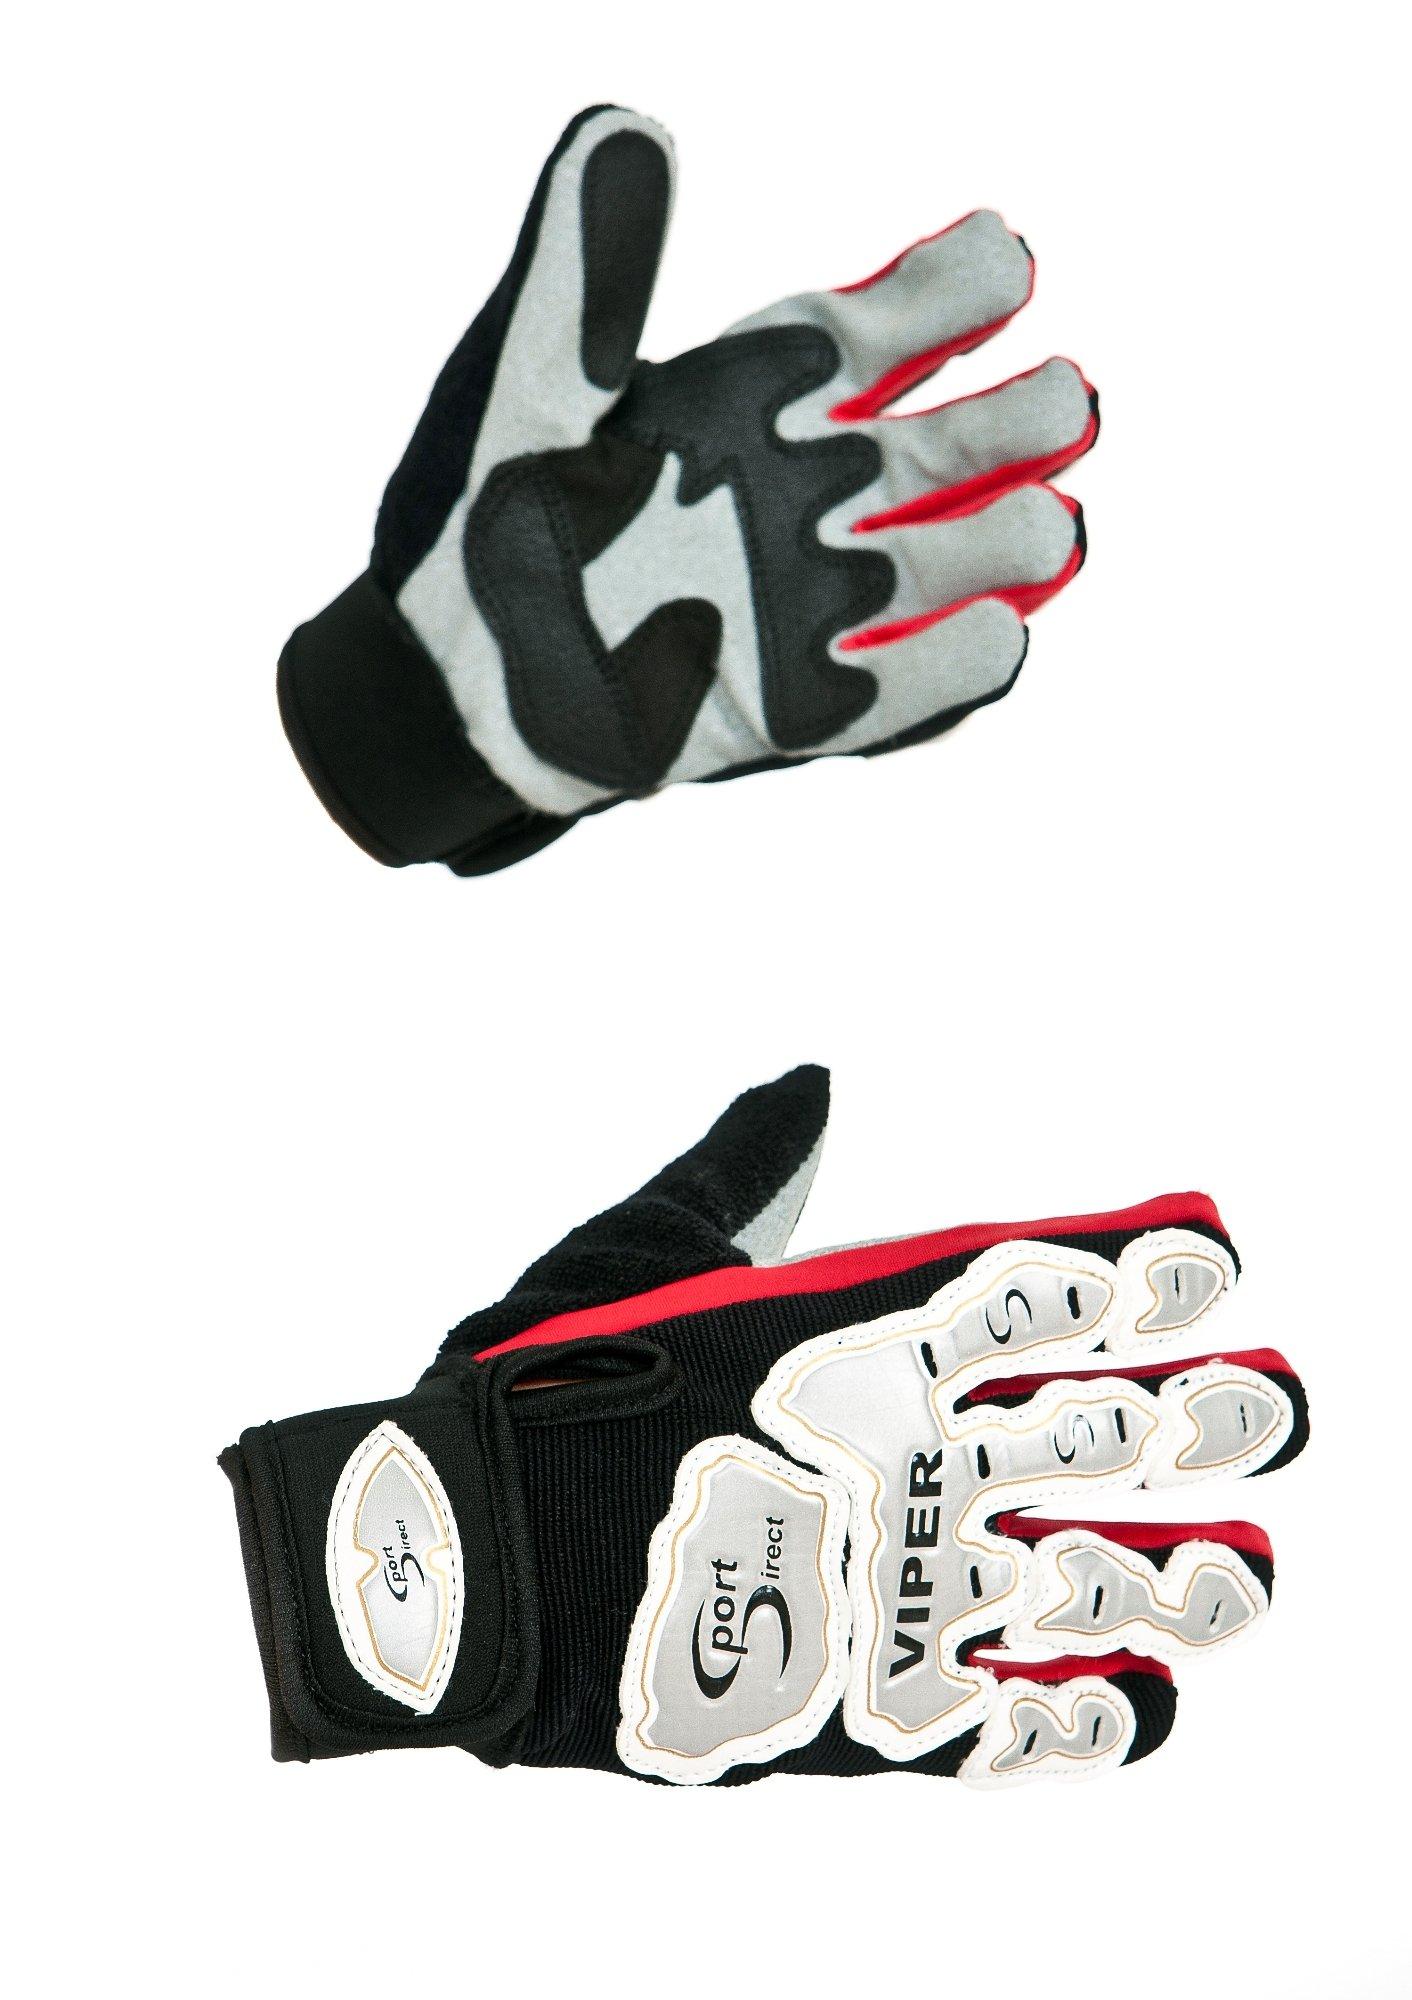 Junior Bmx Viper Bike Gloves by Sport DirectTM (Image #3)